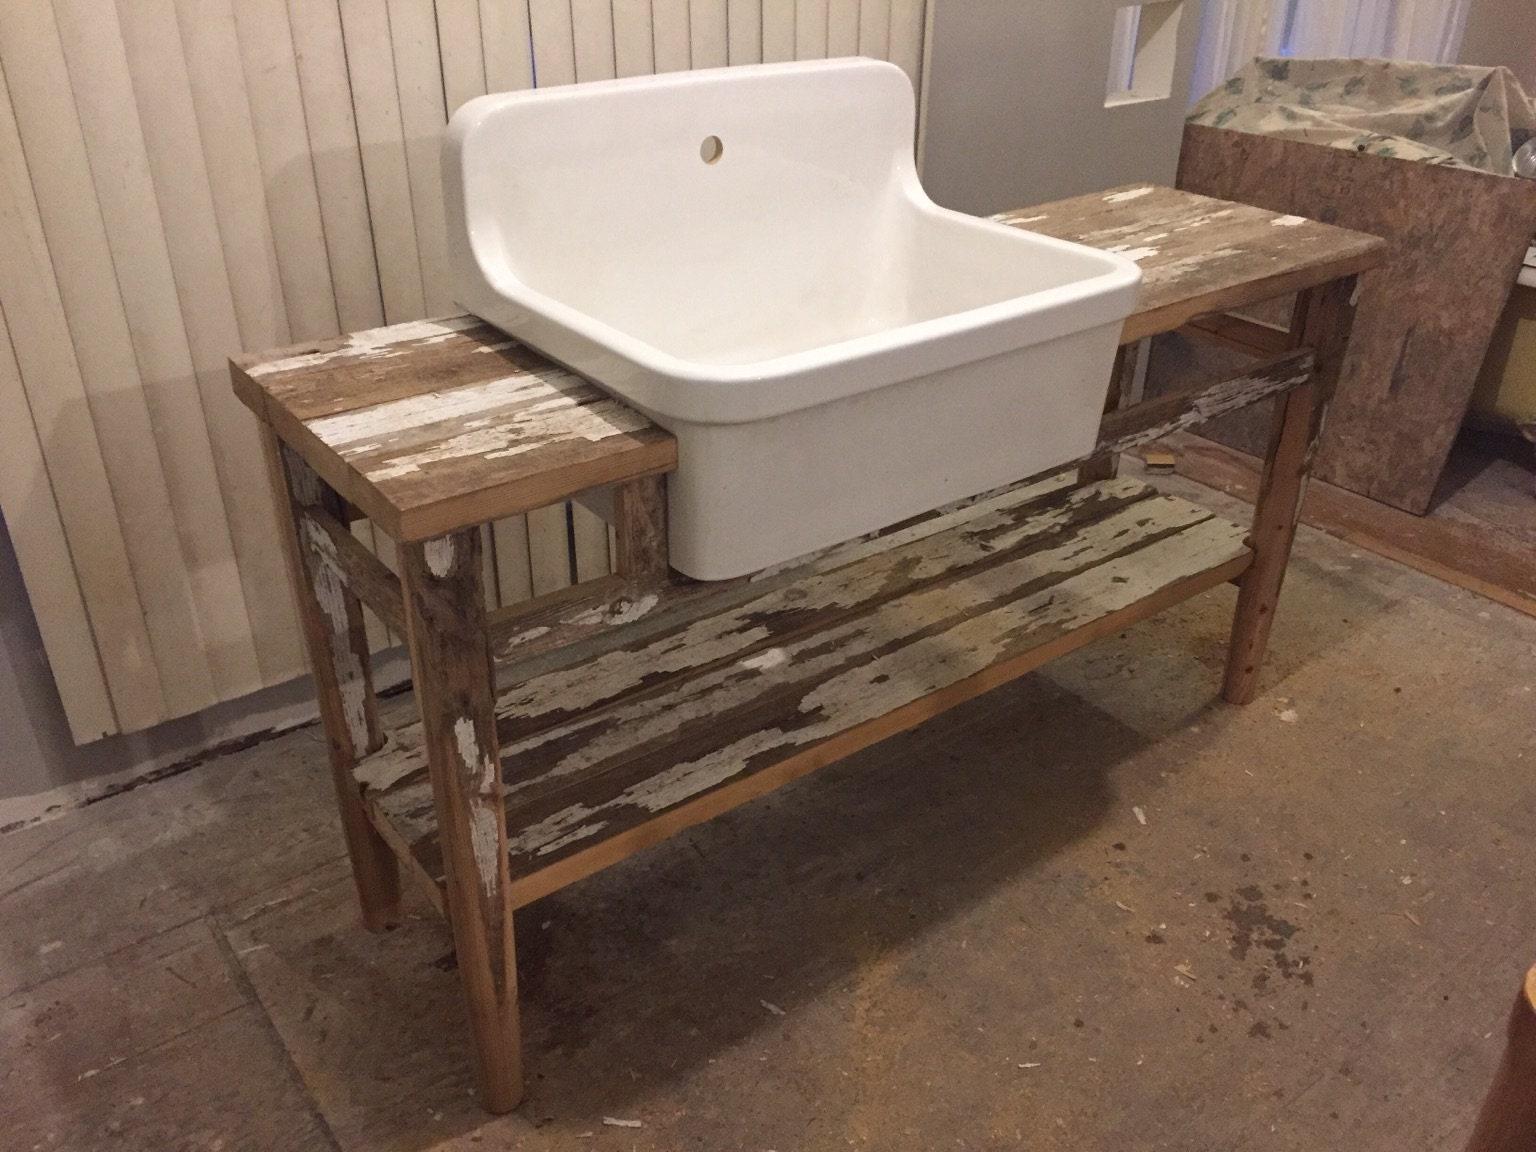 Wonderful Vintage Highback Farmhouse Sink In Custom Wood Stand With Shelf From Antique Farm Fence